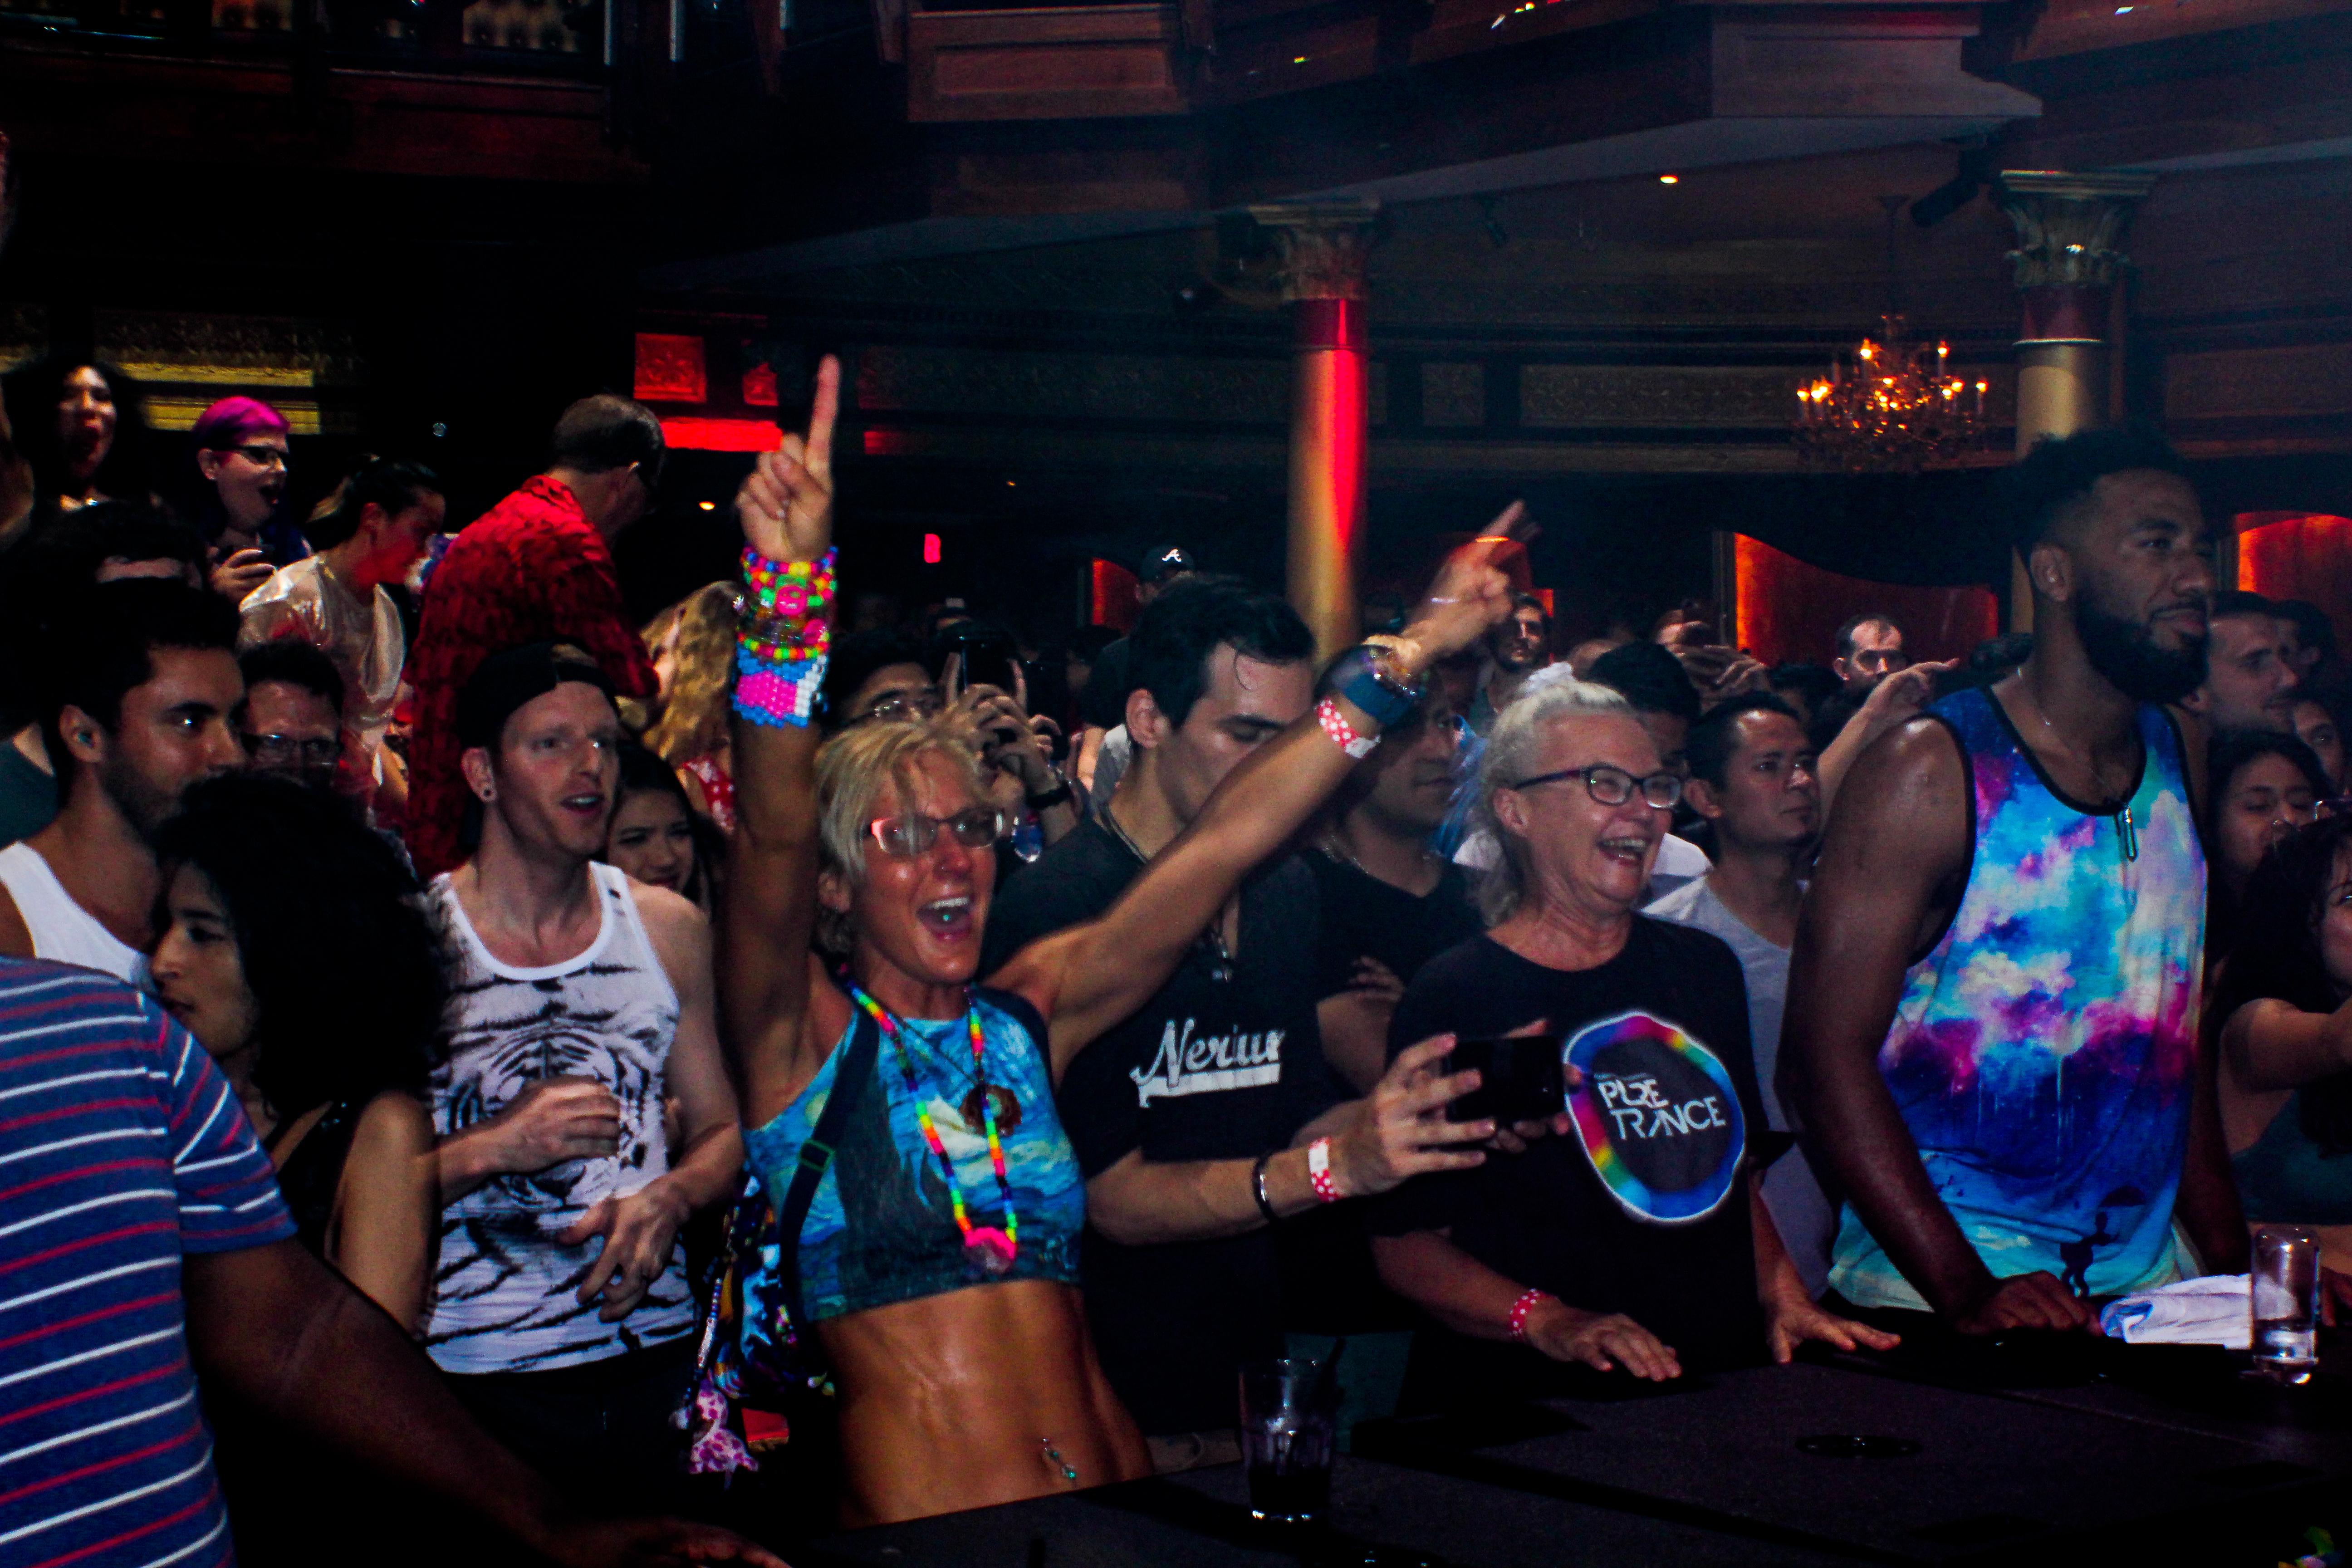 Ferry corsten presents blueprint opera nightclub event review photo credit katrina merca malvernweather Choice Image